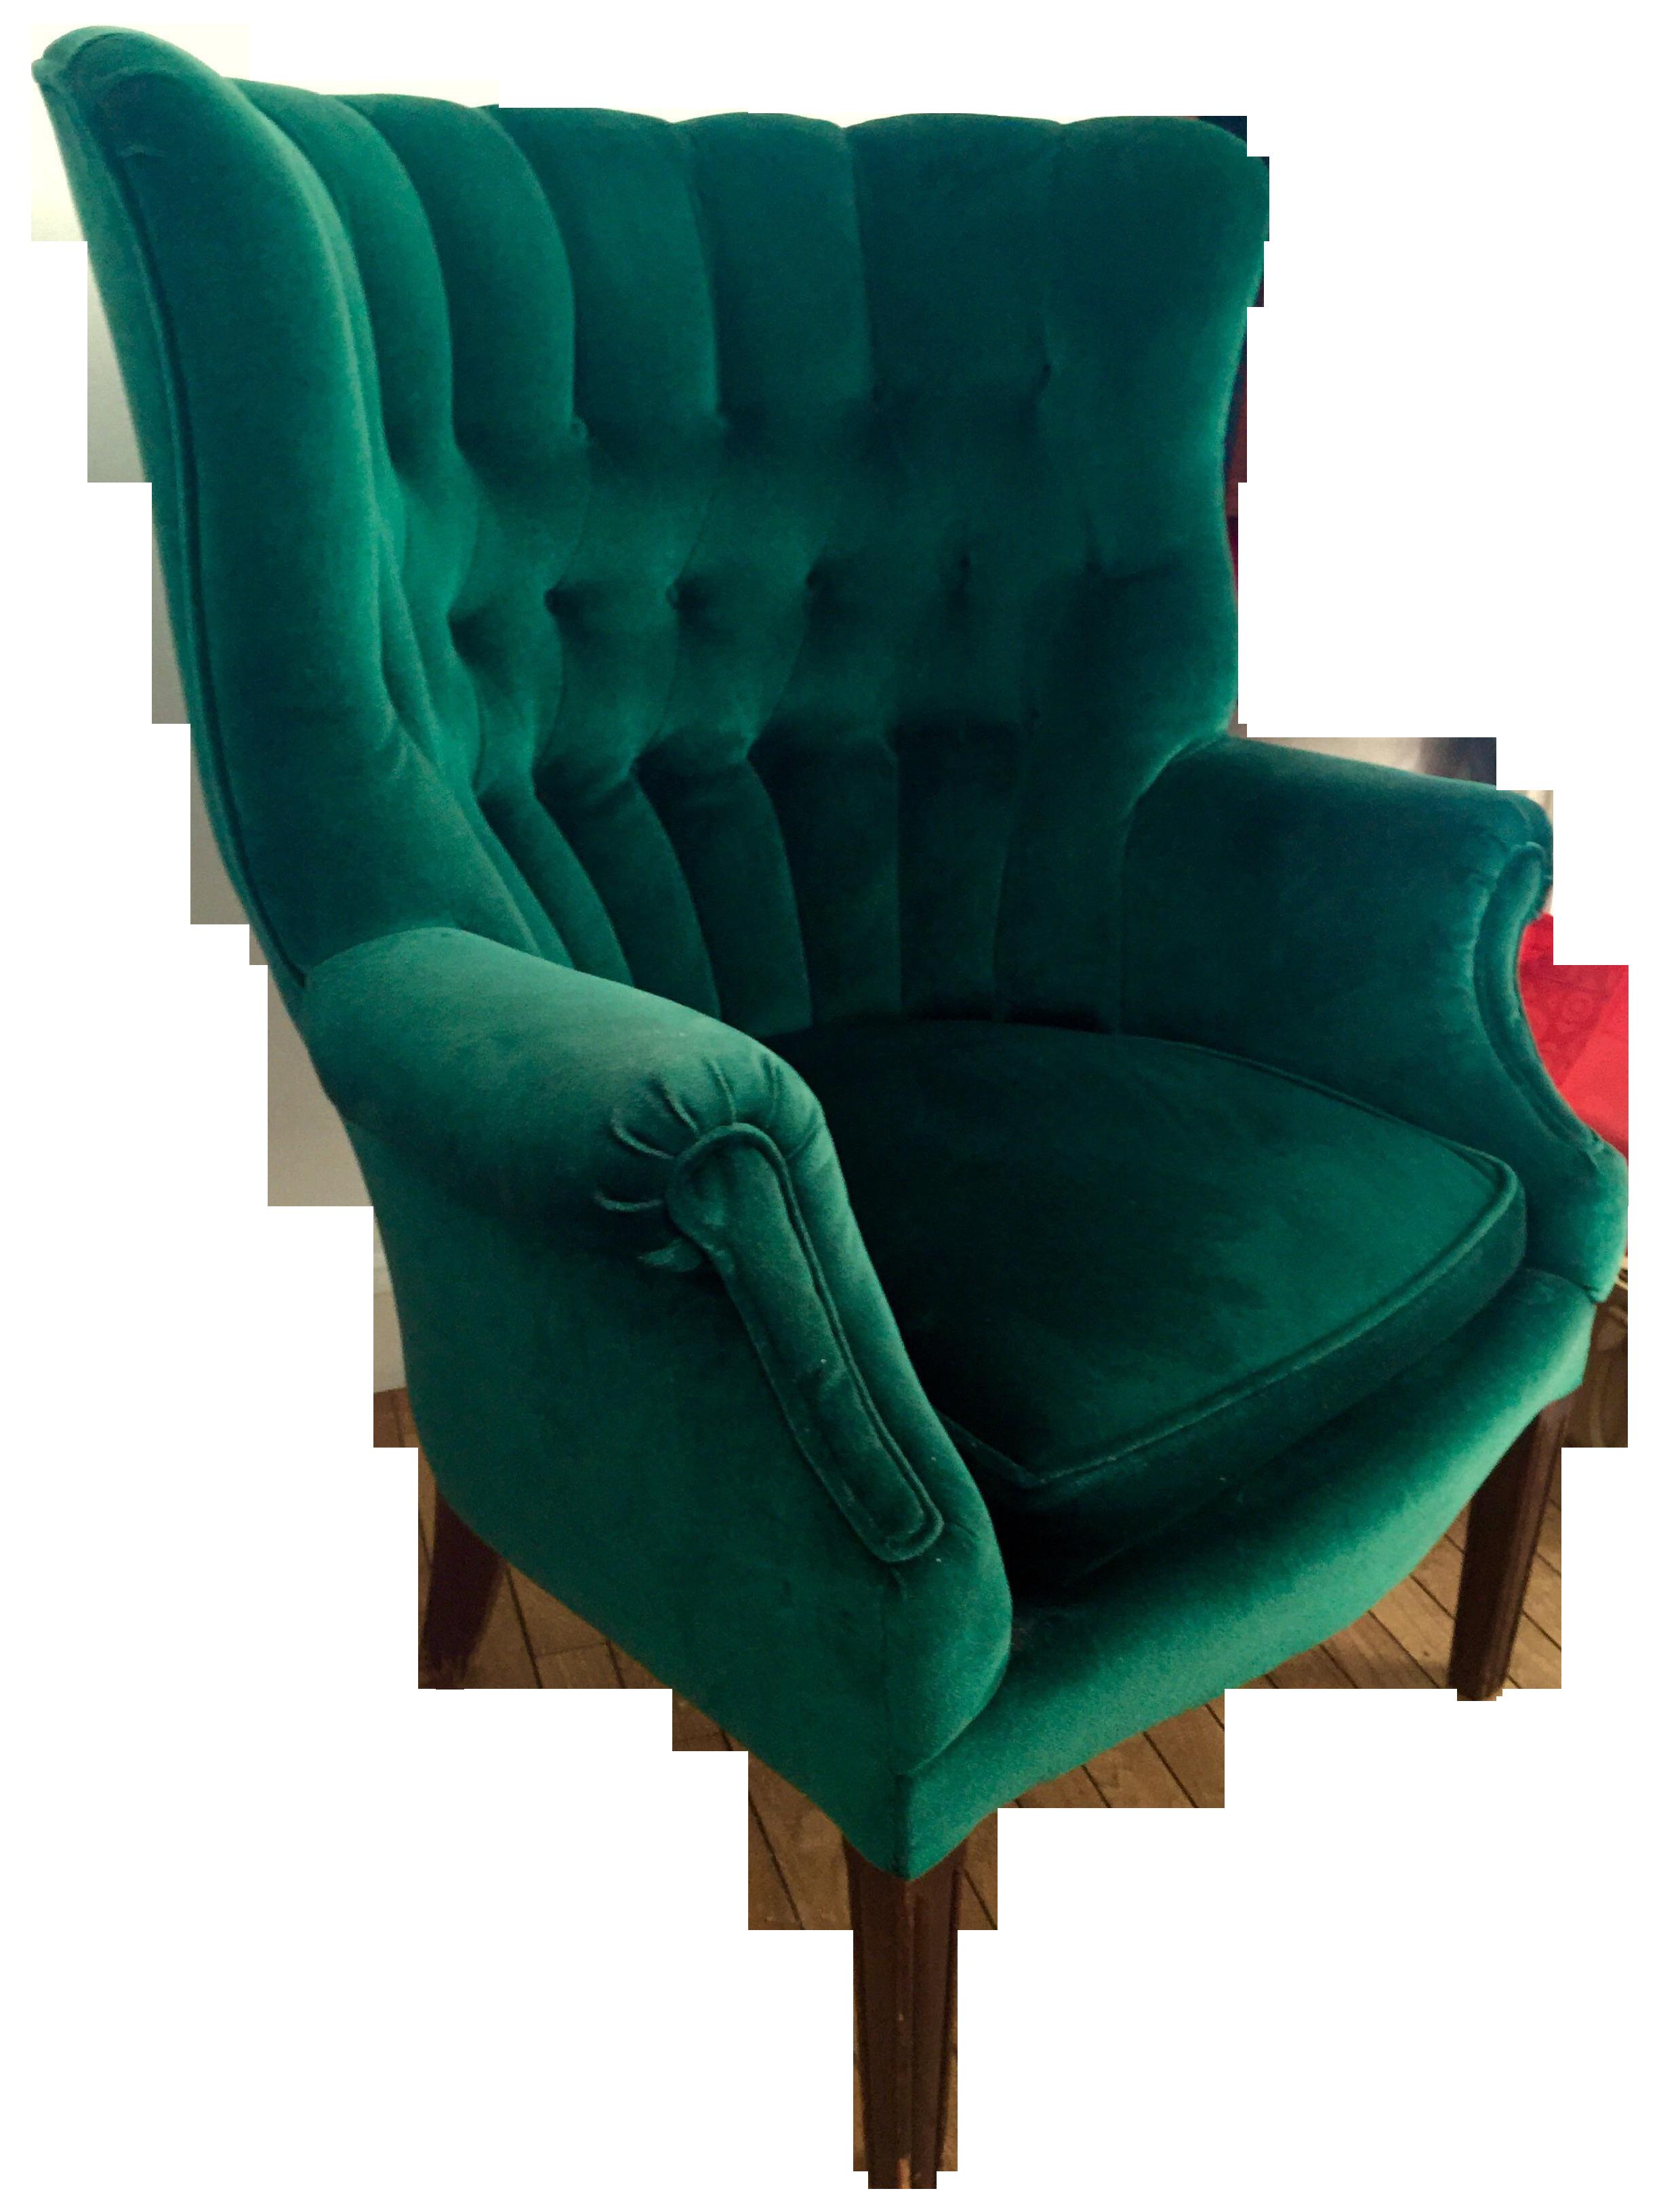 Vintage Emerald Green Armchair | Chairish